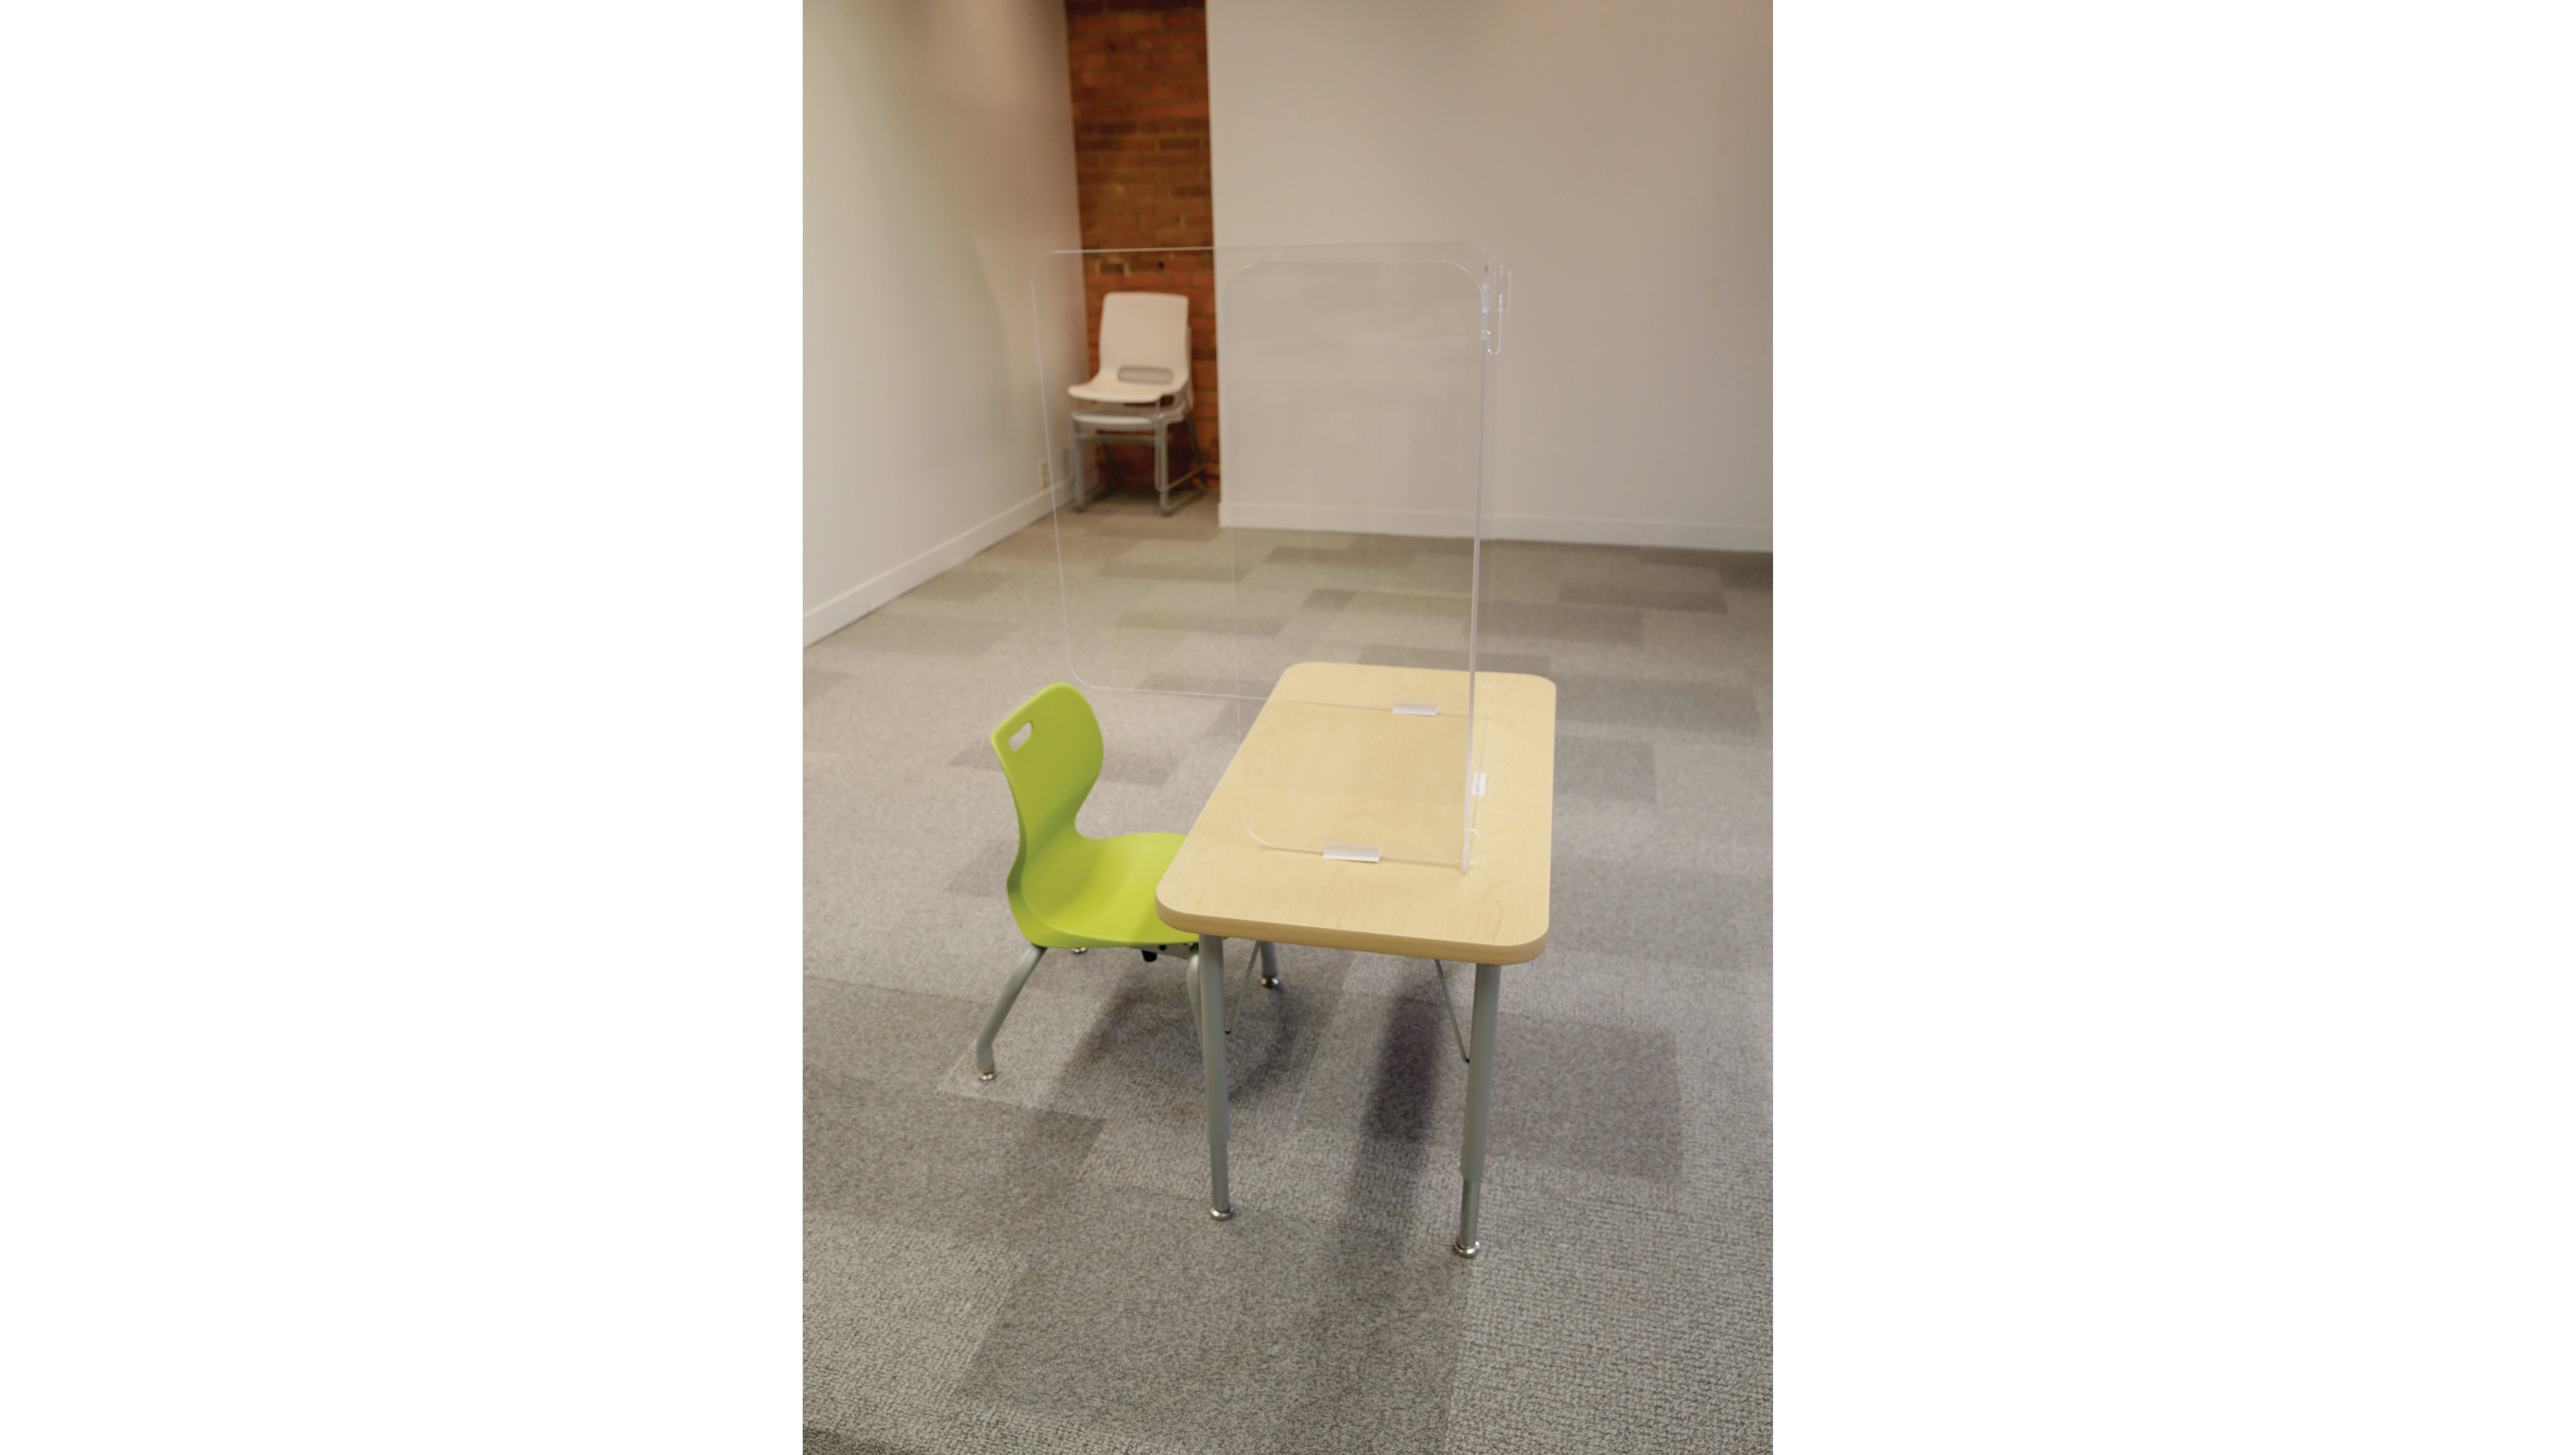 SmartLink Chair with Build Desk and Acrylic Desktop U-Screen